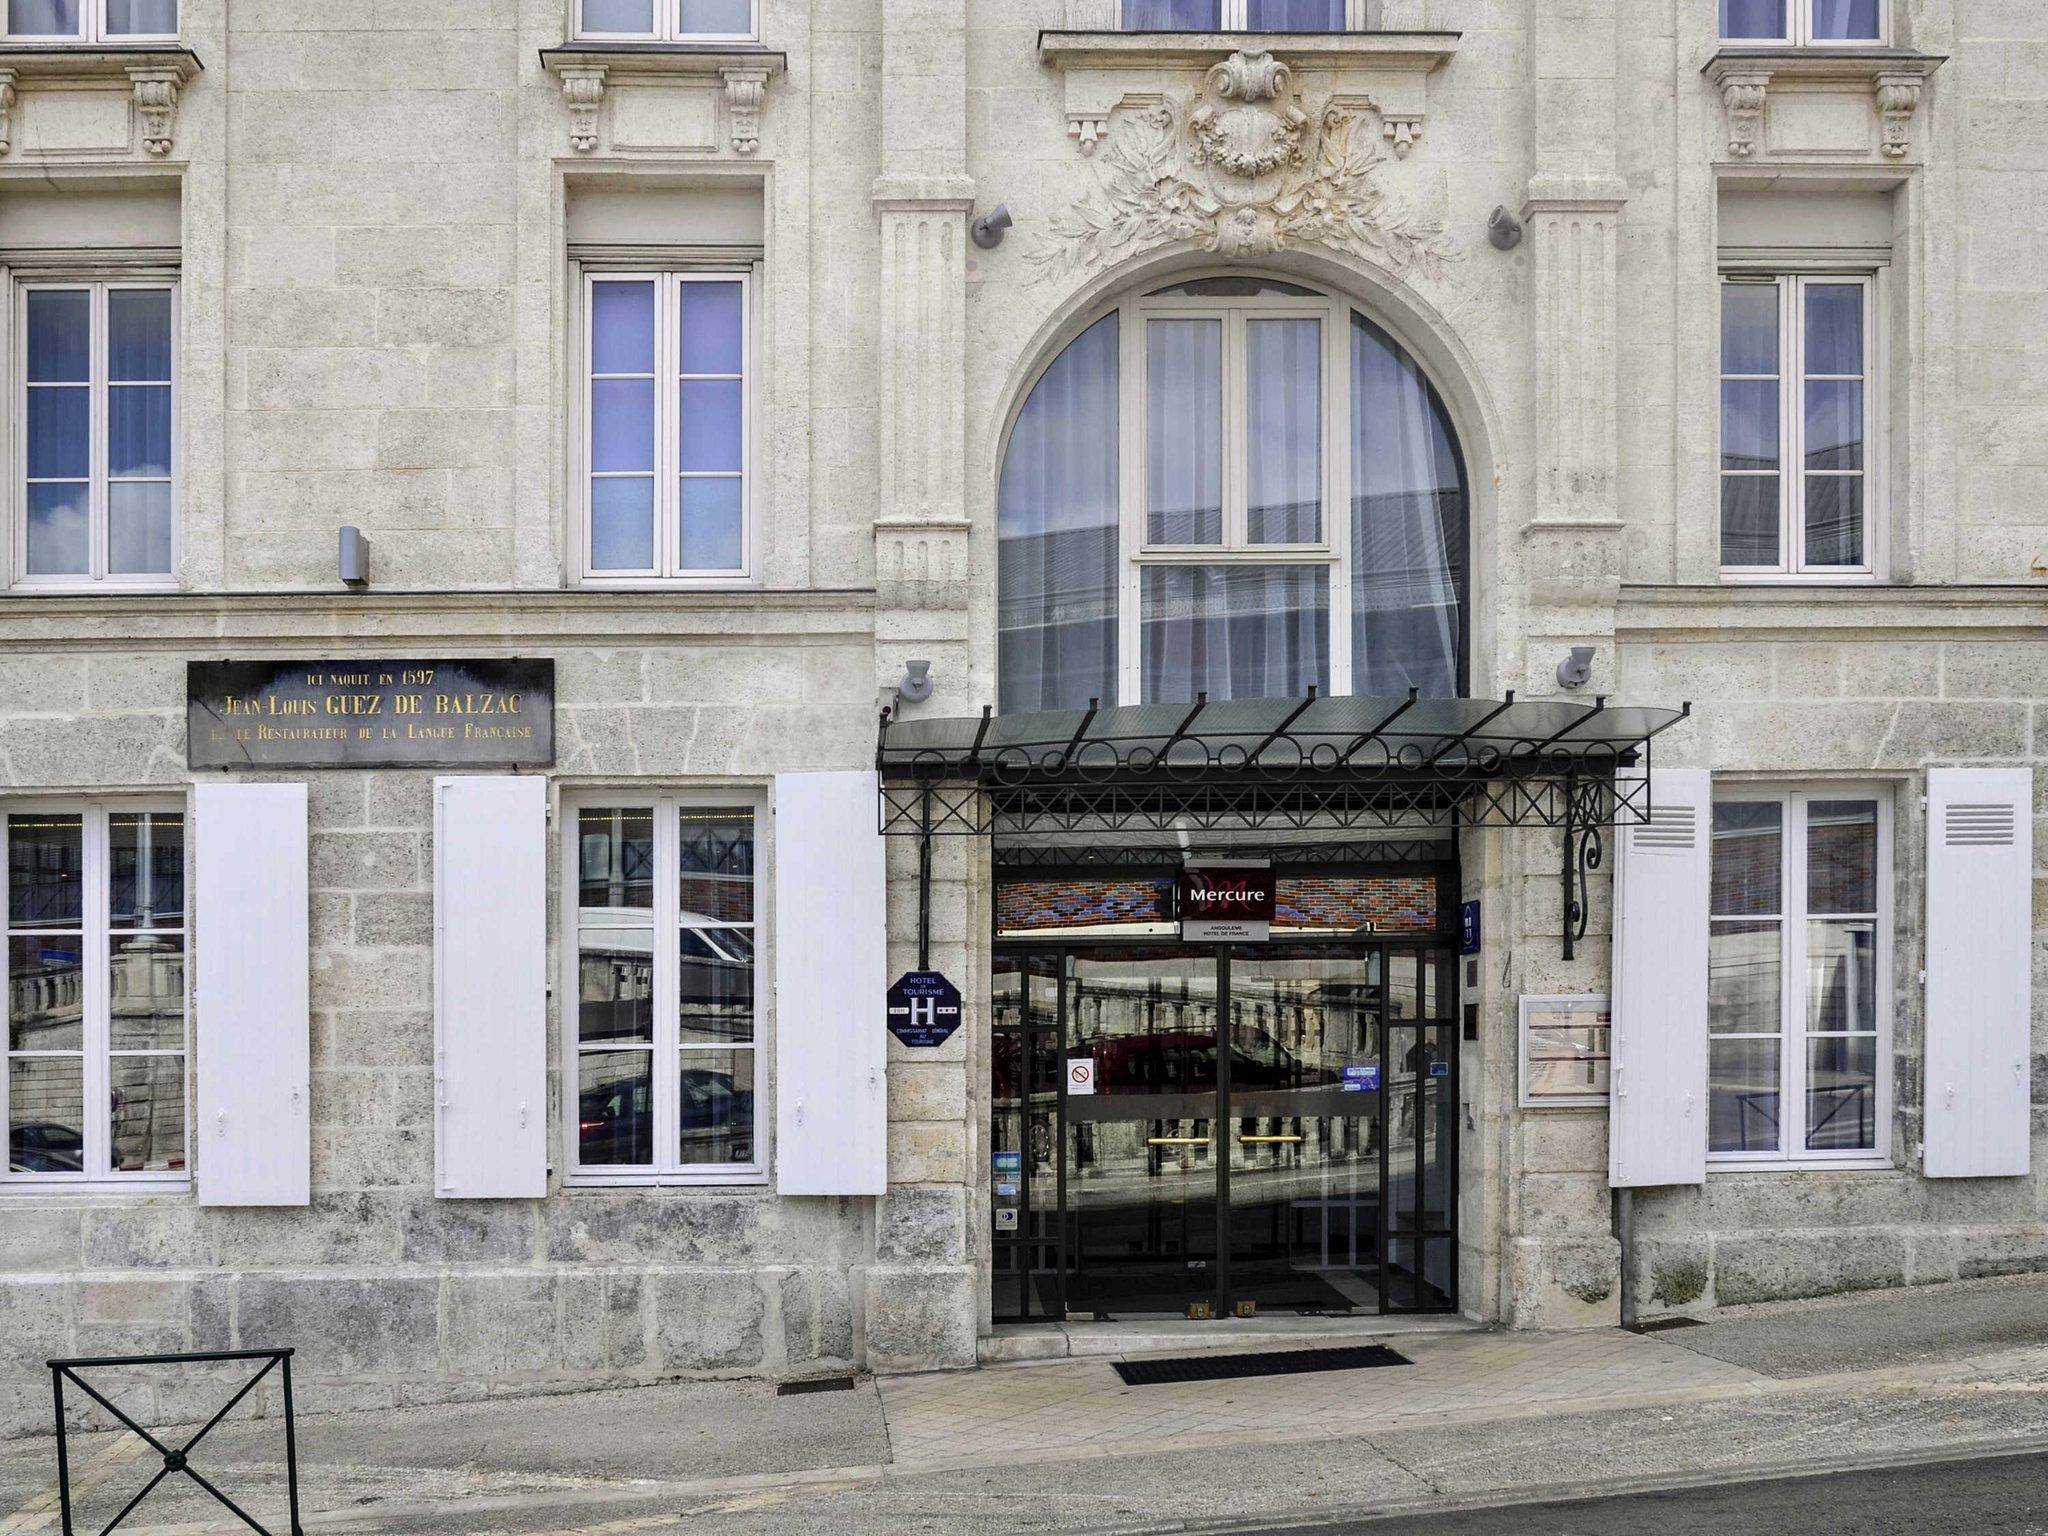 Mercure Hotel de France Angouleme